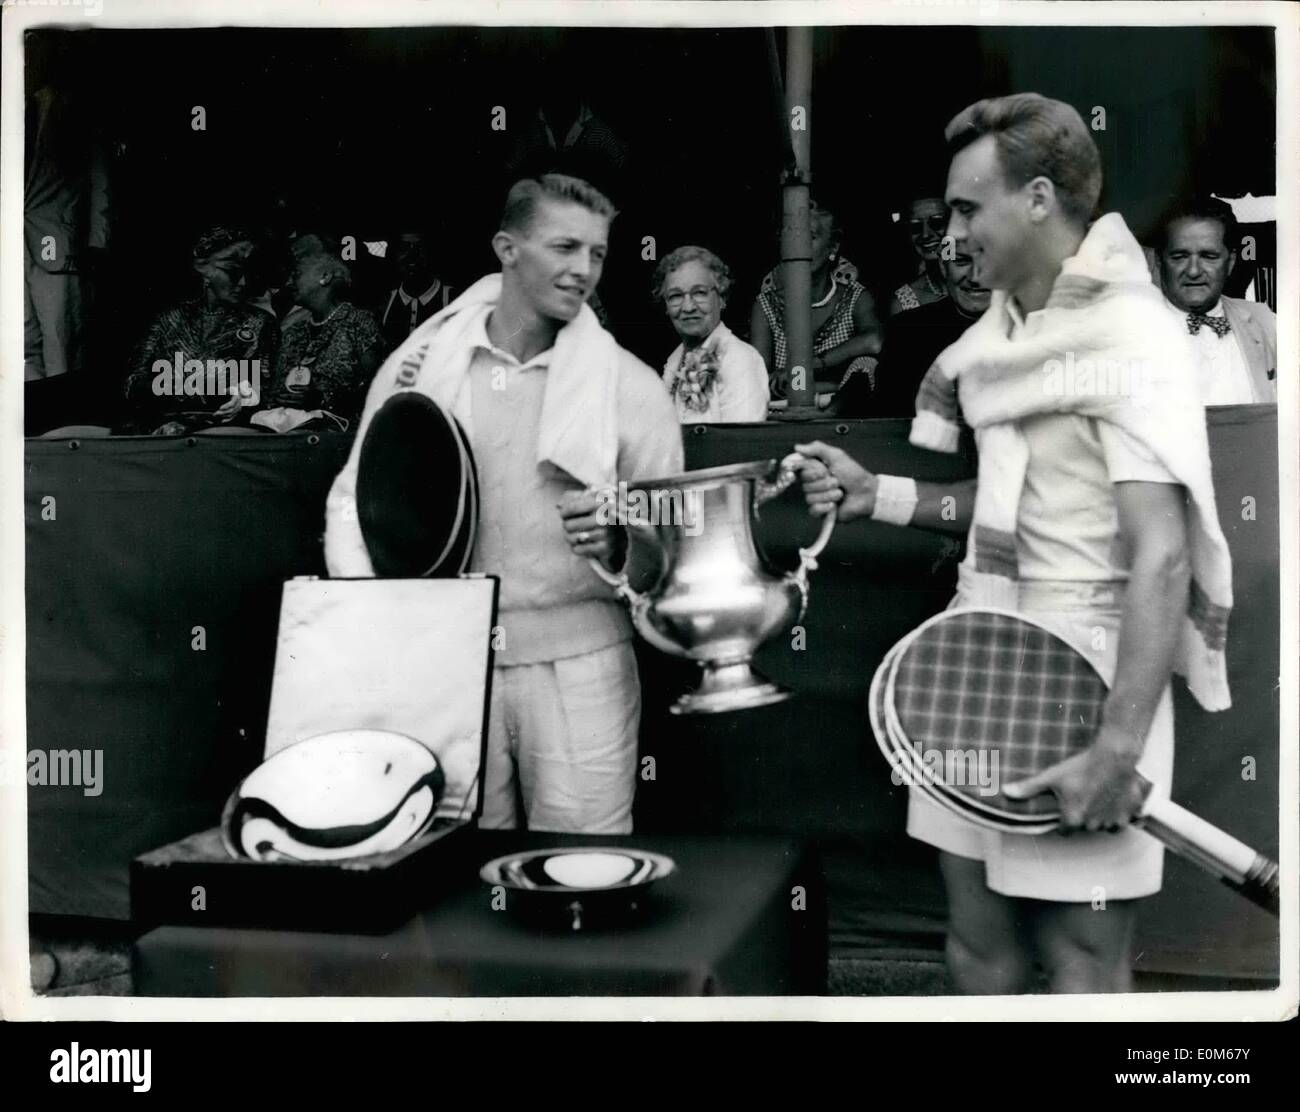 Amateur Tennis Player Stockfotos & Amateur Tennis Player Bilder